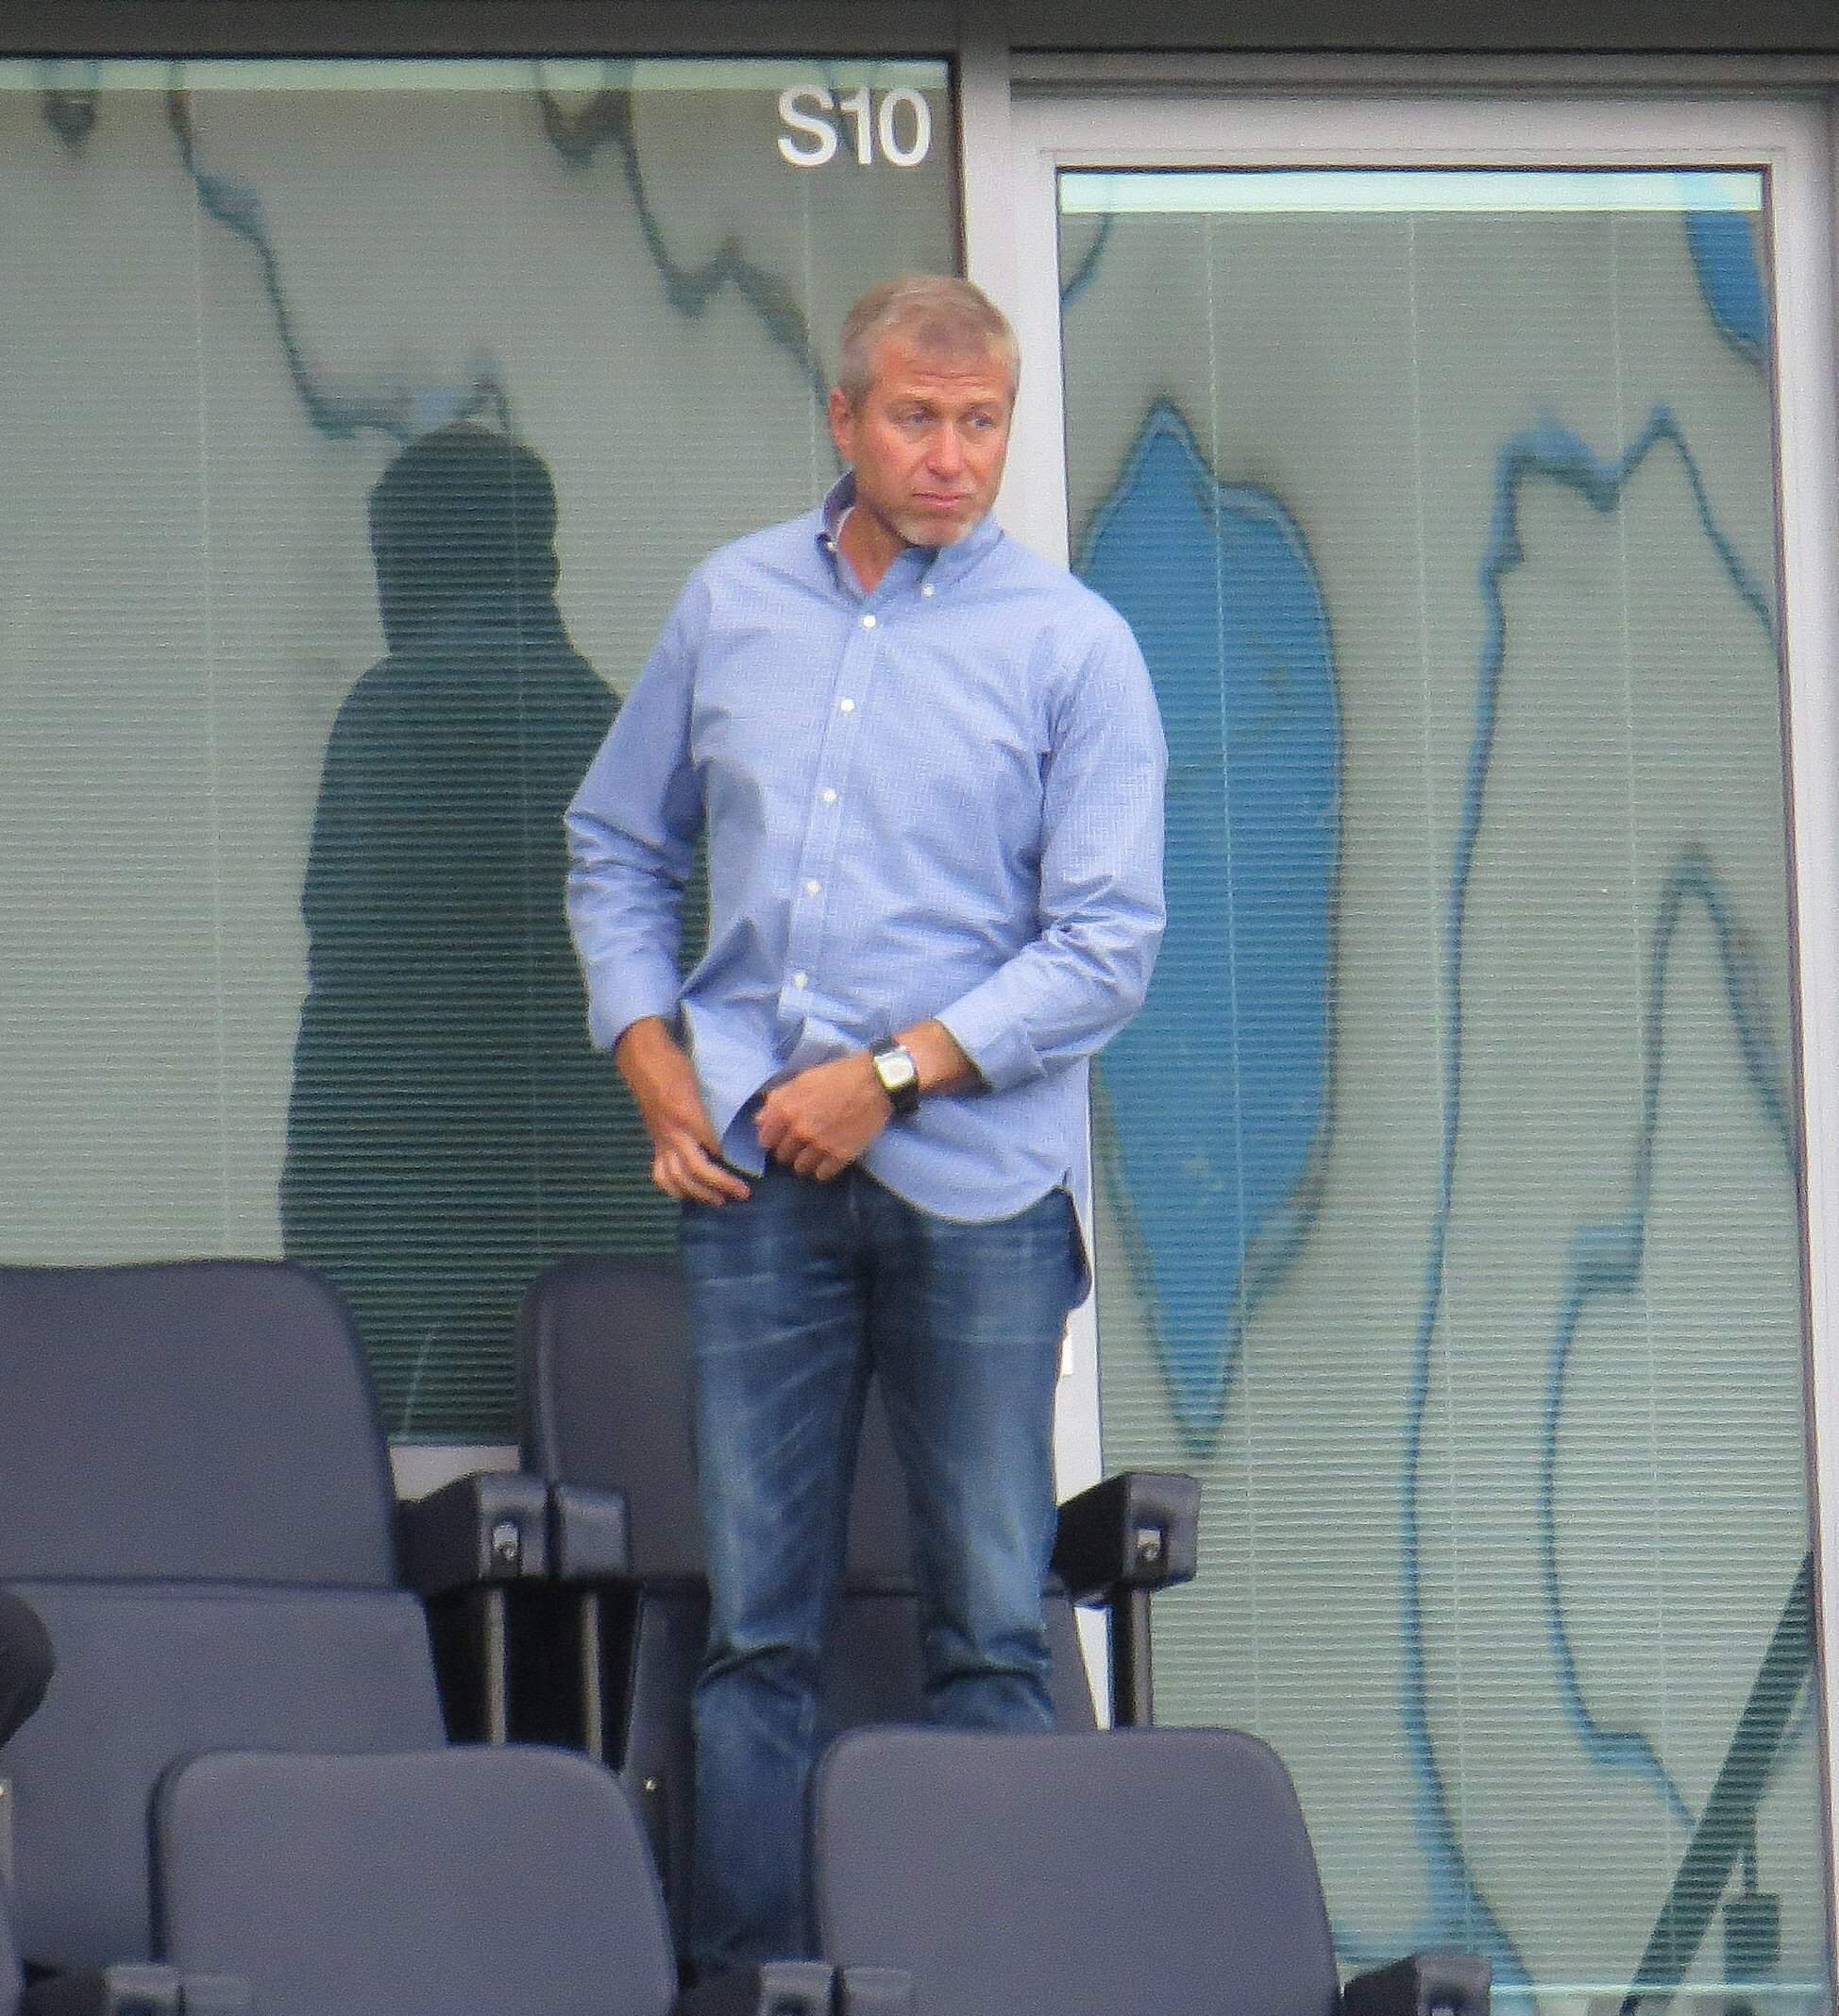 Roman Abramovich, football club owners